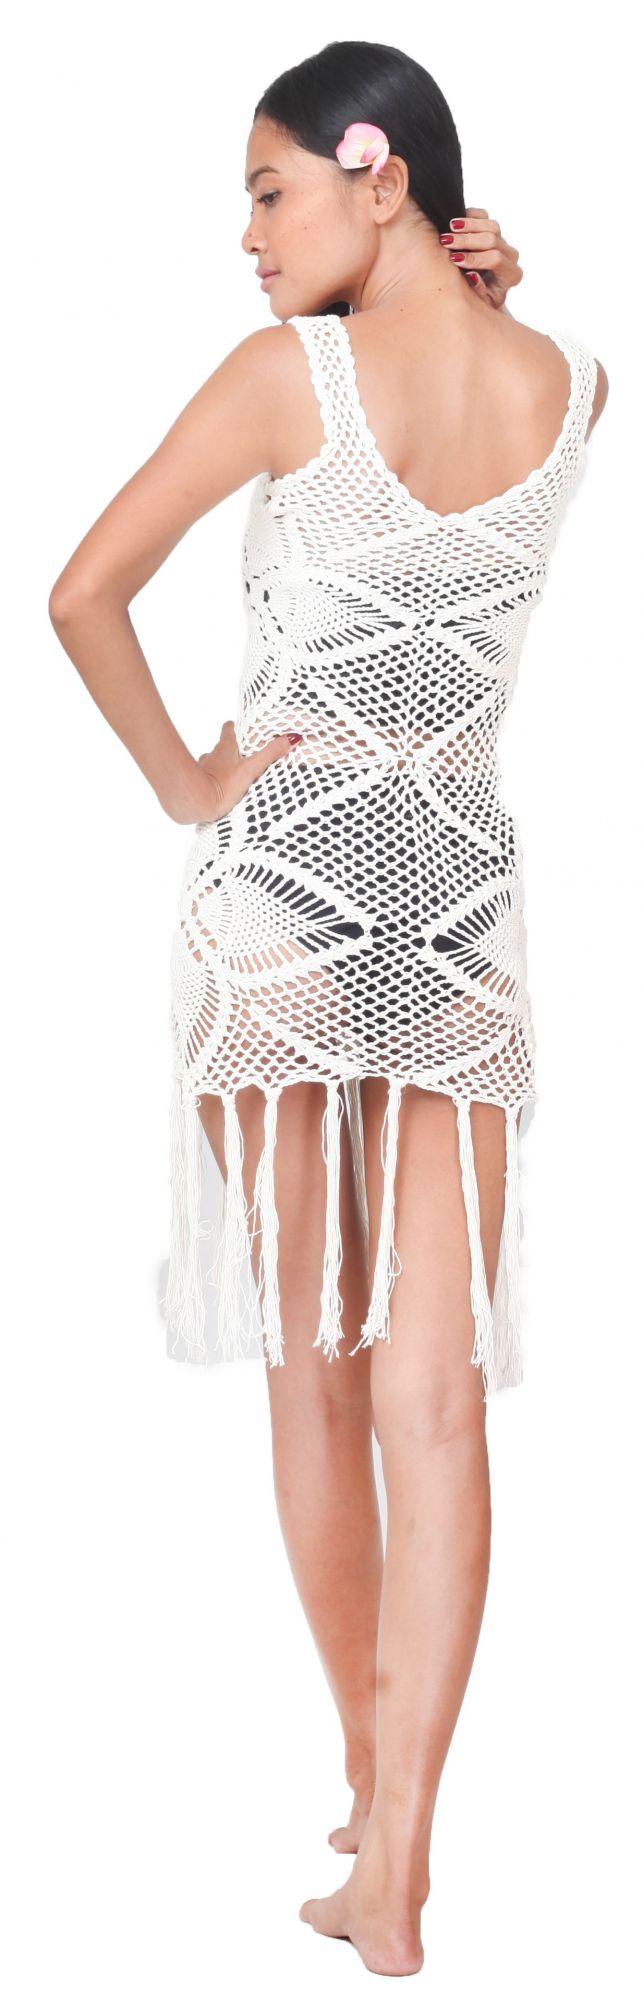 Robe de plage crochet blanche